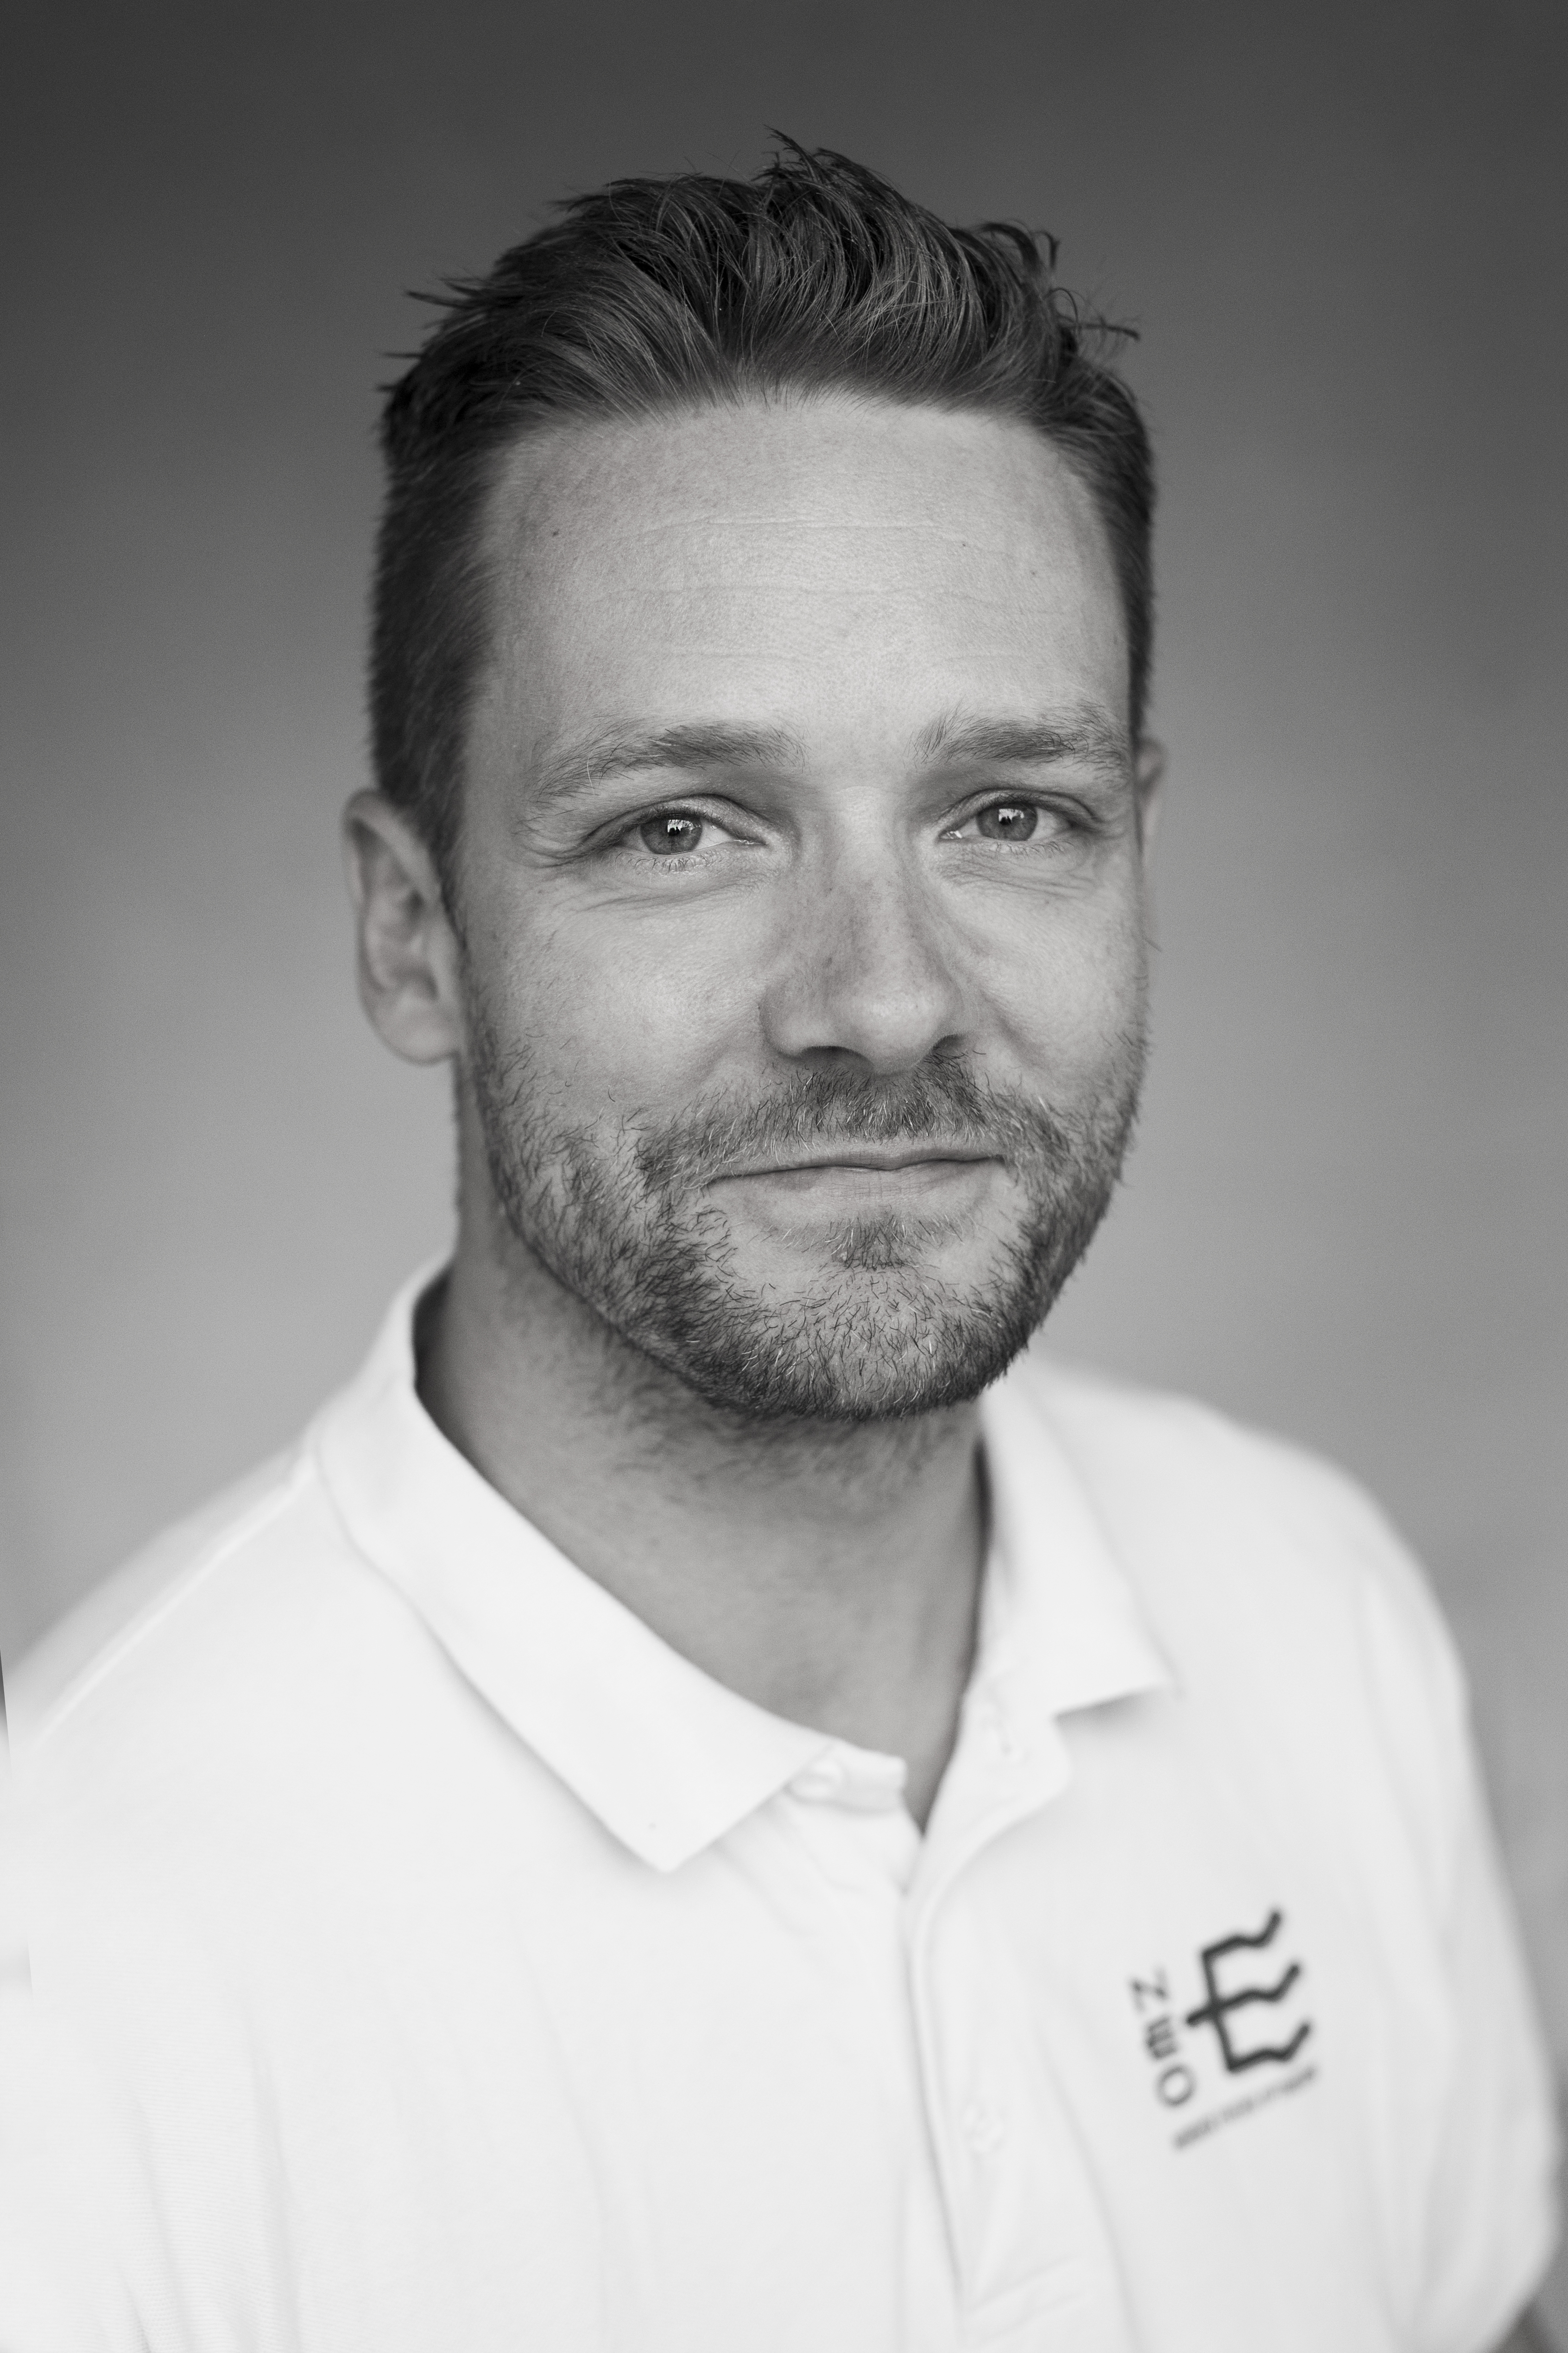 Henrik Sjölander